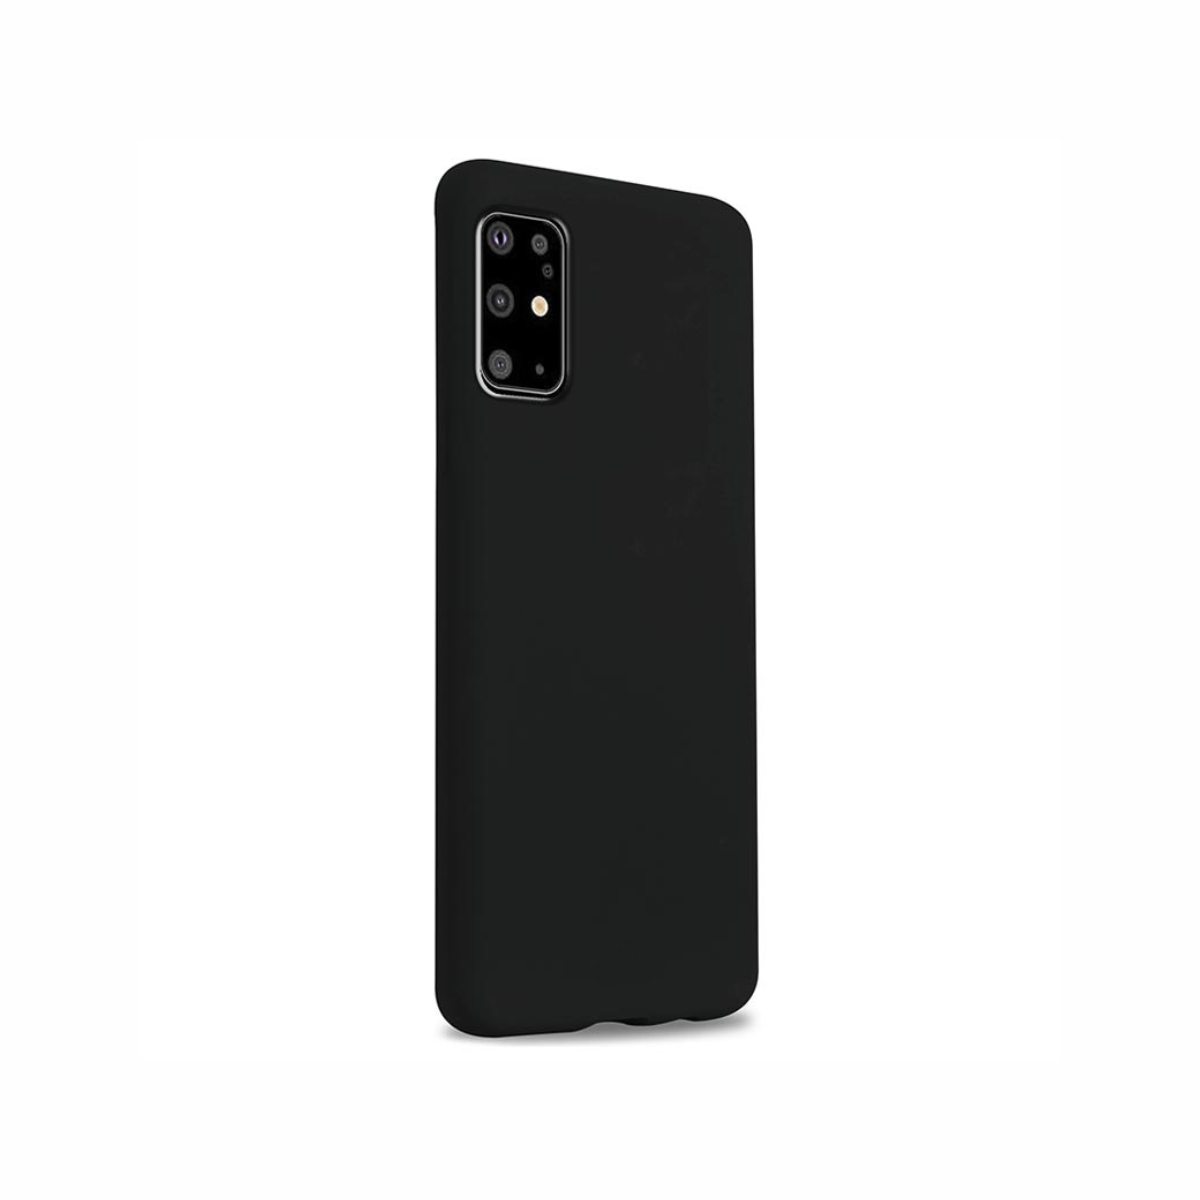 Carcasa neagra tip Silicone Cover pentru Samsung Galaxy S20 Plus/S20 Plus 5G imagine